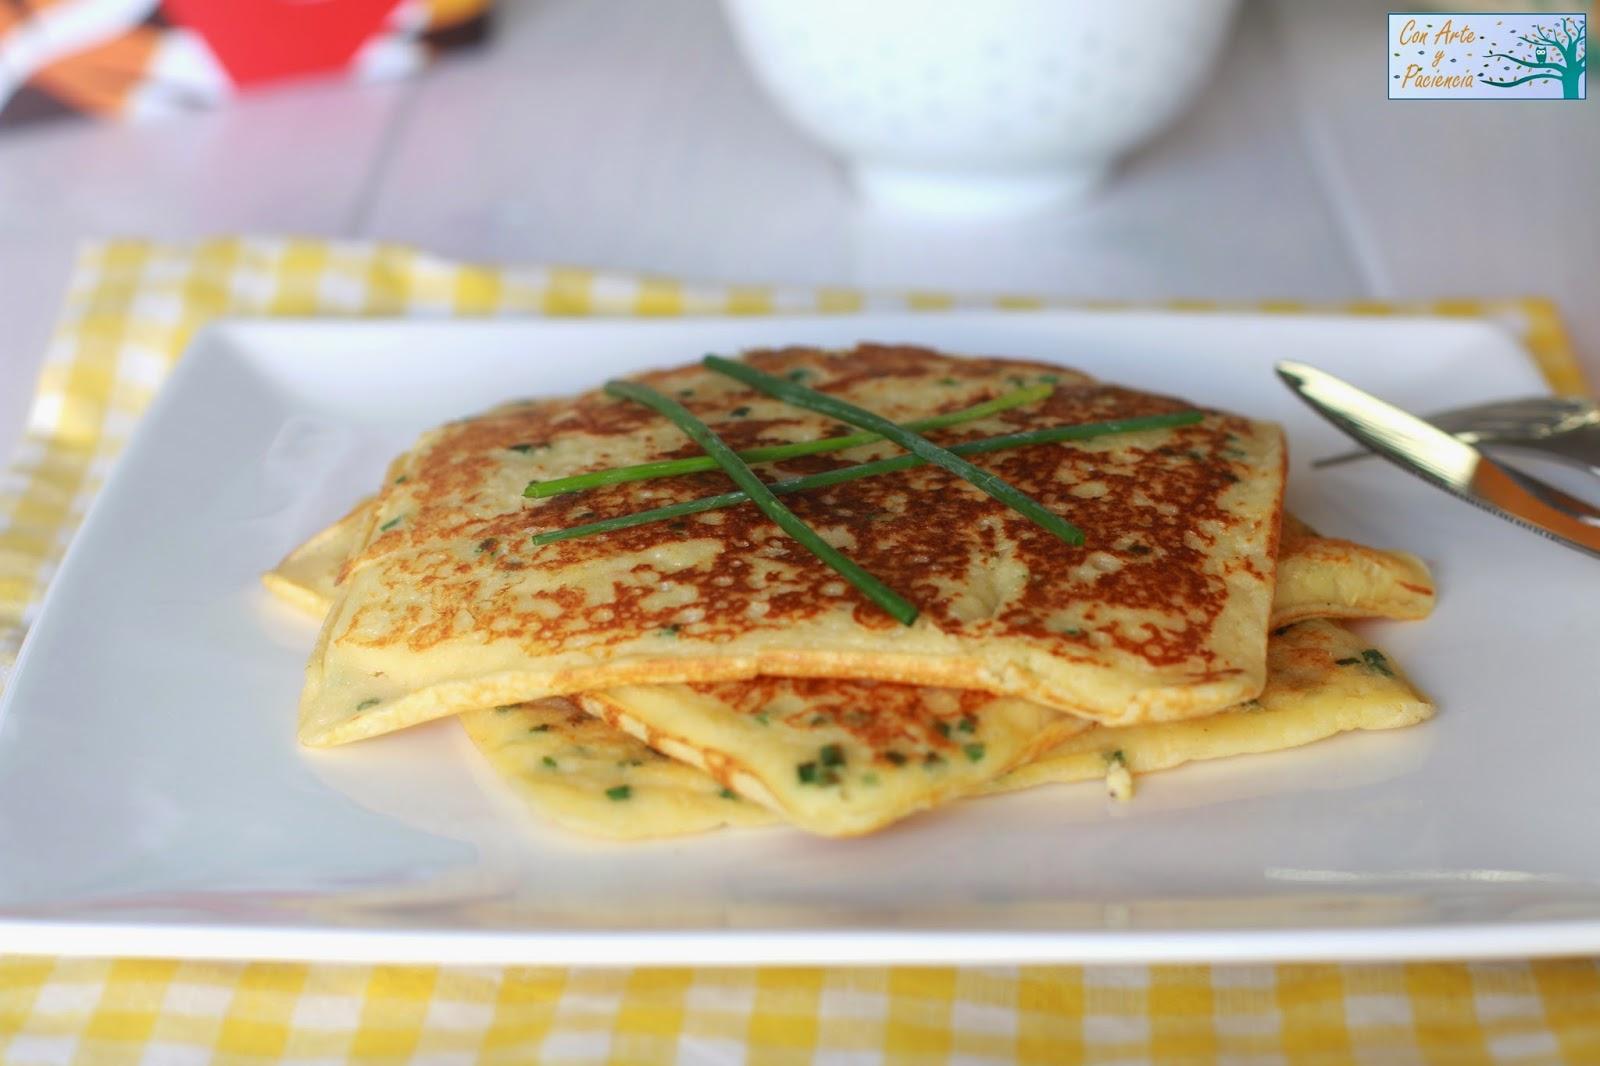 tortitas,pancakes,cebollino,huevo,harina,leche,huevo,egg,milk,sartén,gofres,waffles,mantequilla,desayuno,breakfast,cena,dinner,tomates,cherry,revueltos,vegetariano,vegetarian